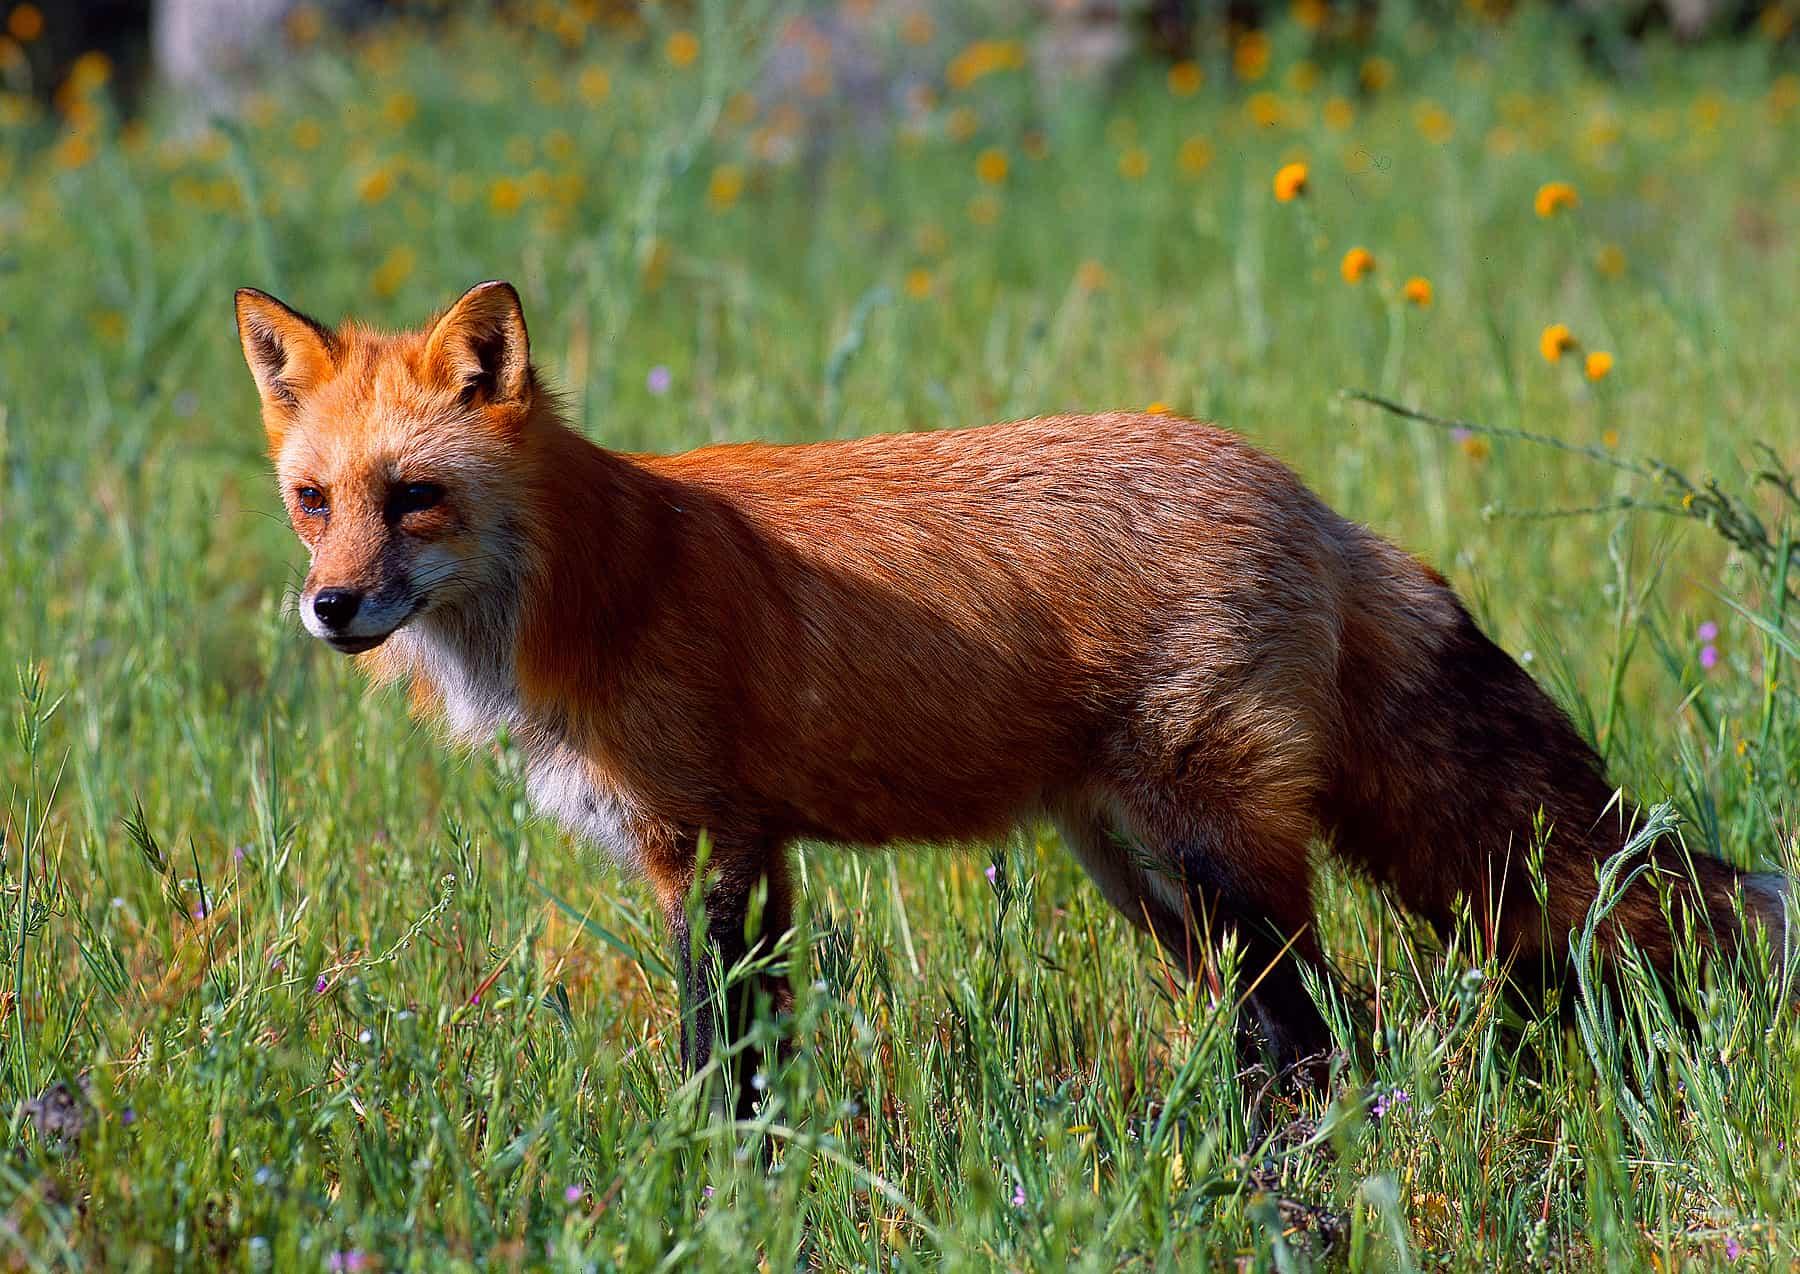 zuckerman_wildlife_photography_image02